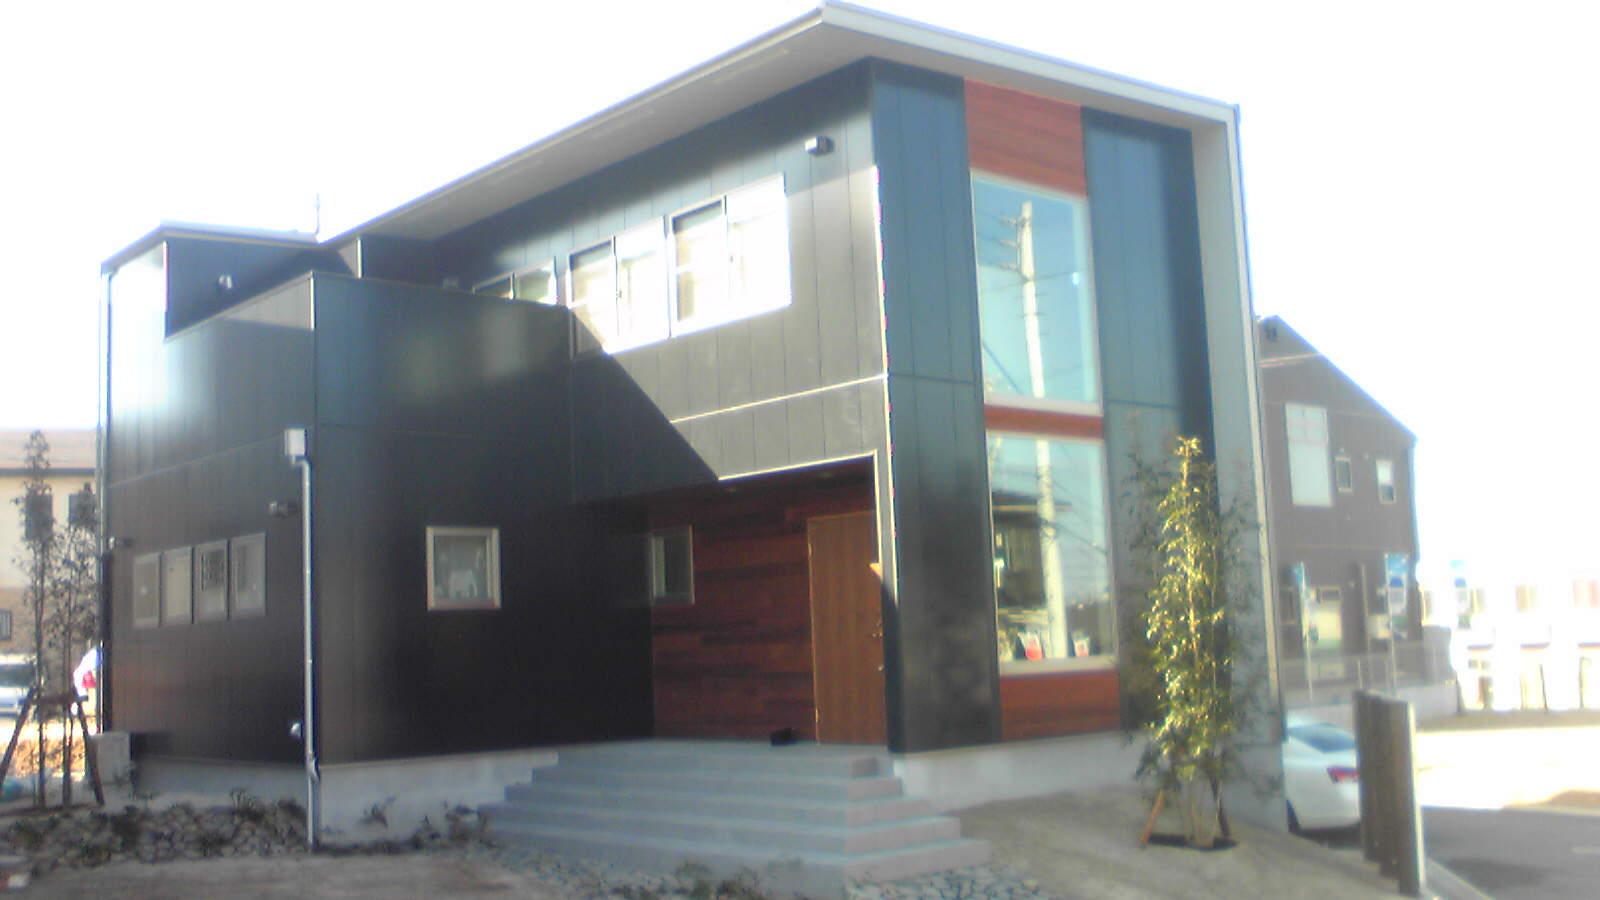 20110119-Image1741.jpg